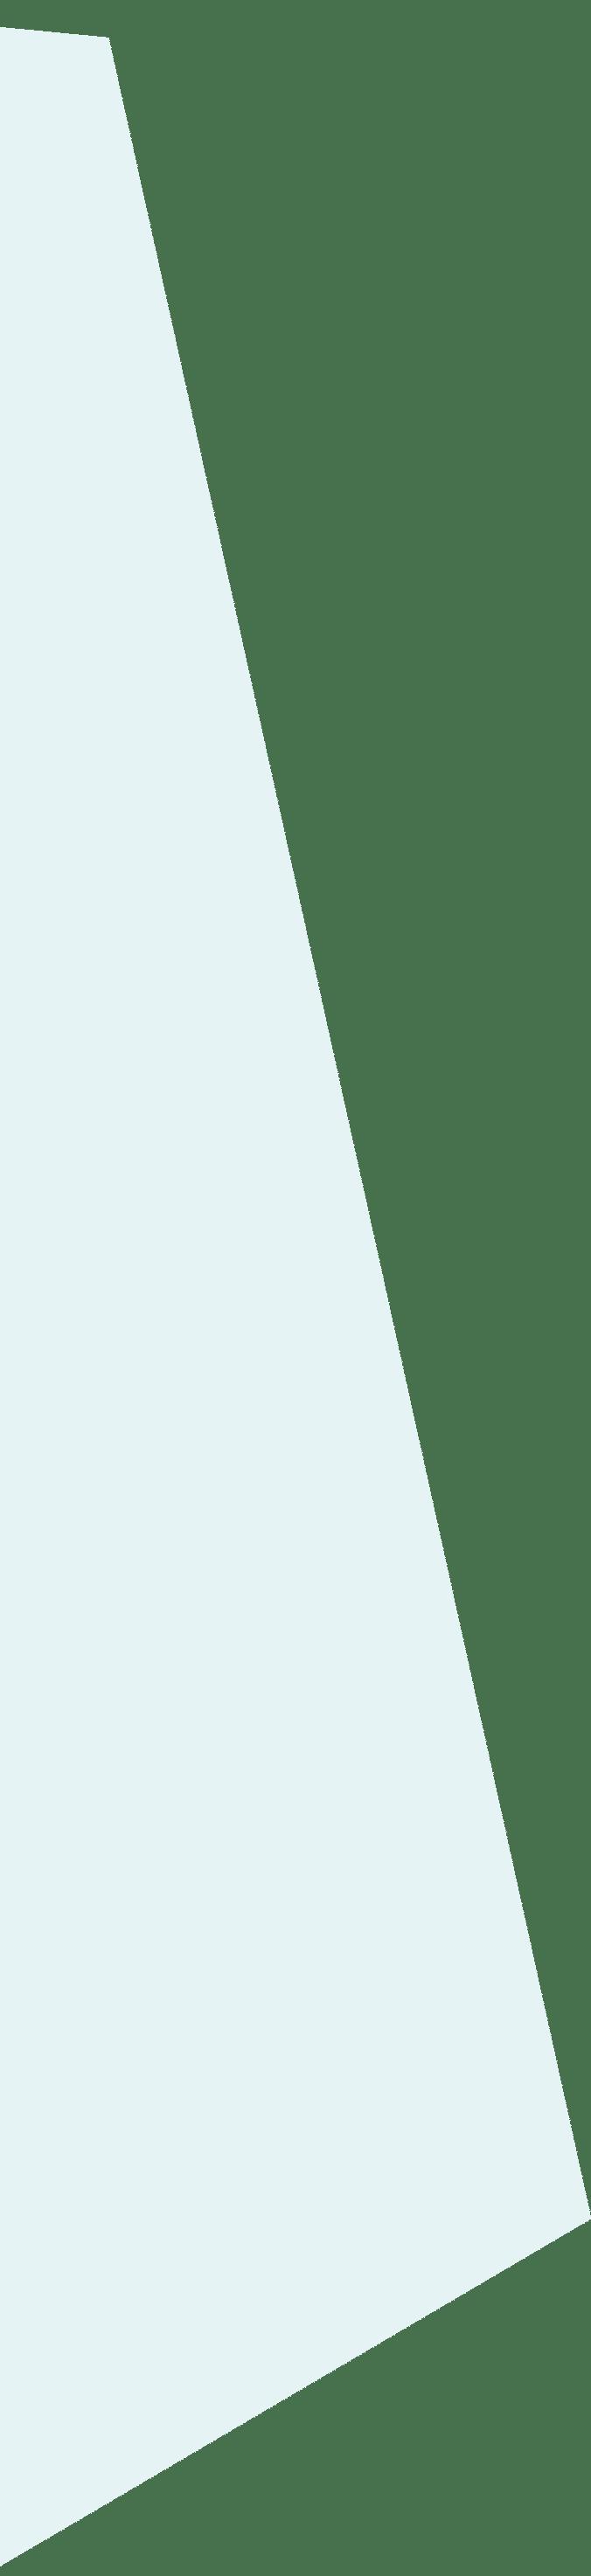 fond-bleu-gauche-morana